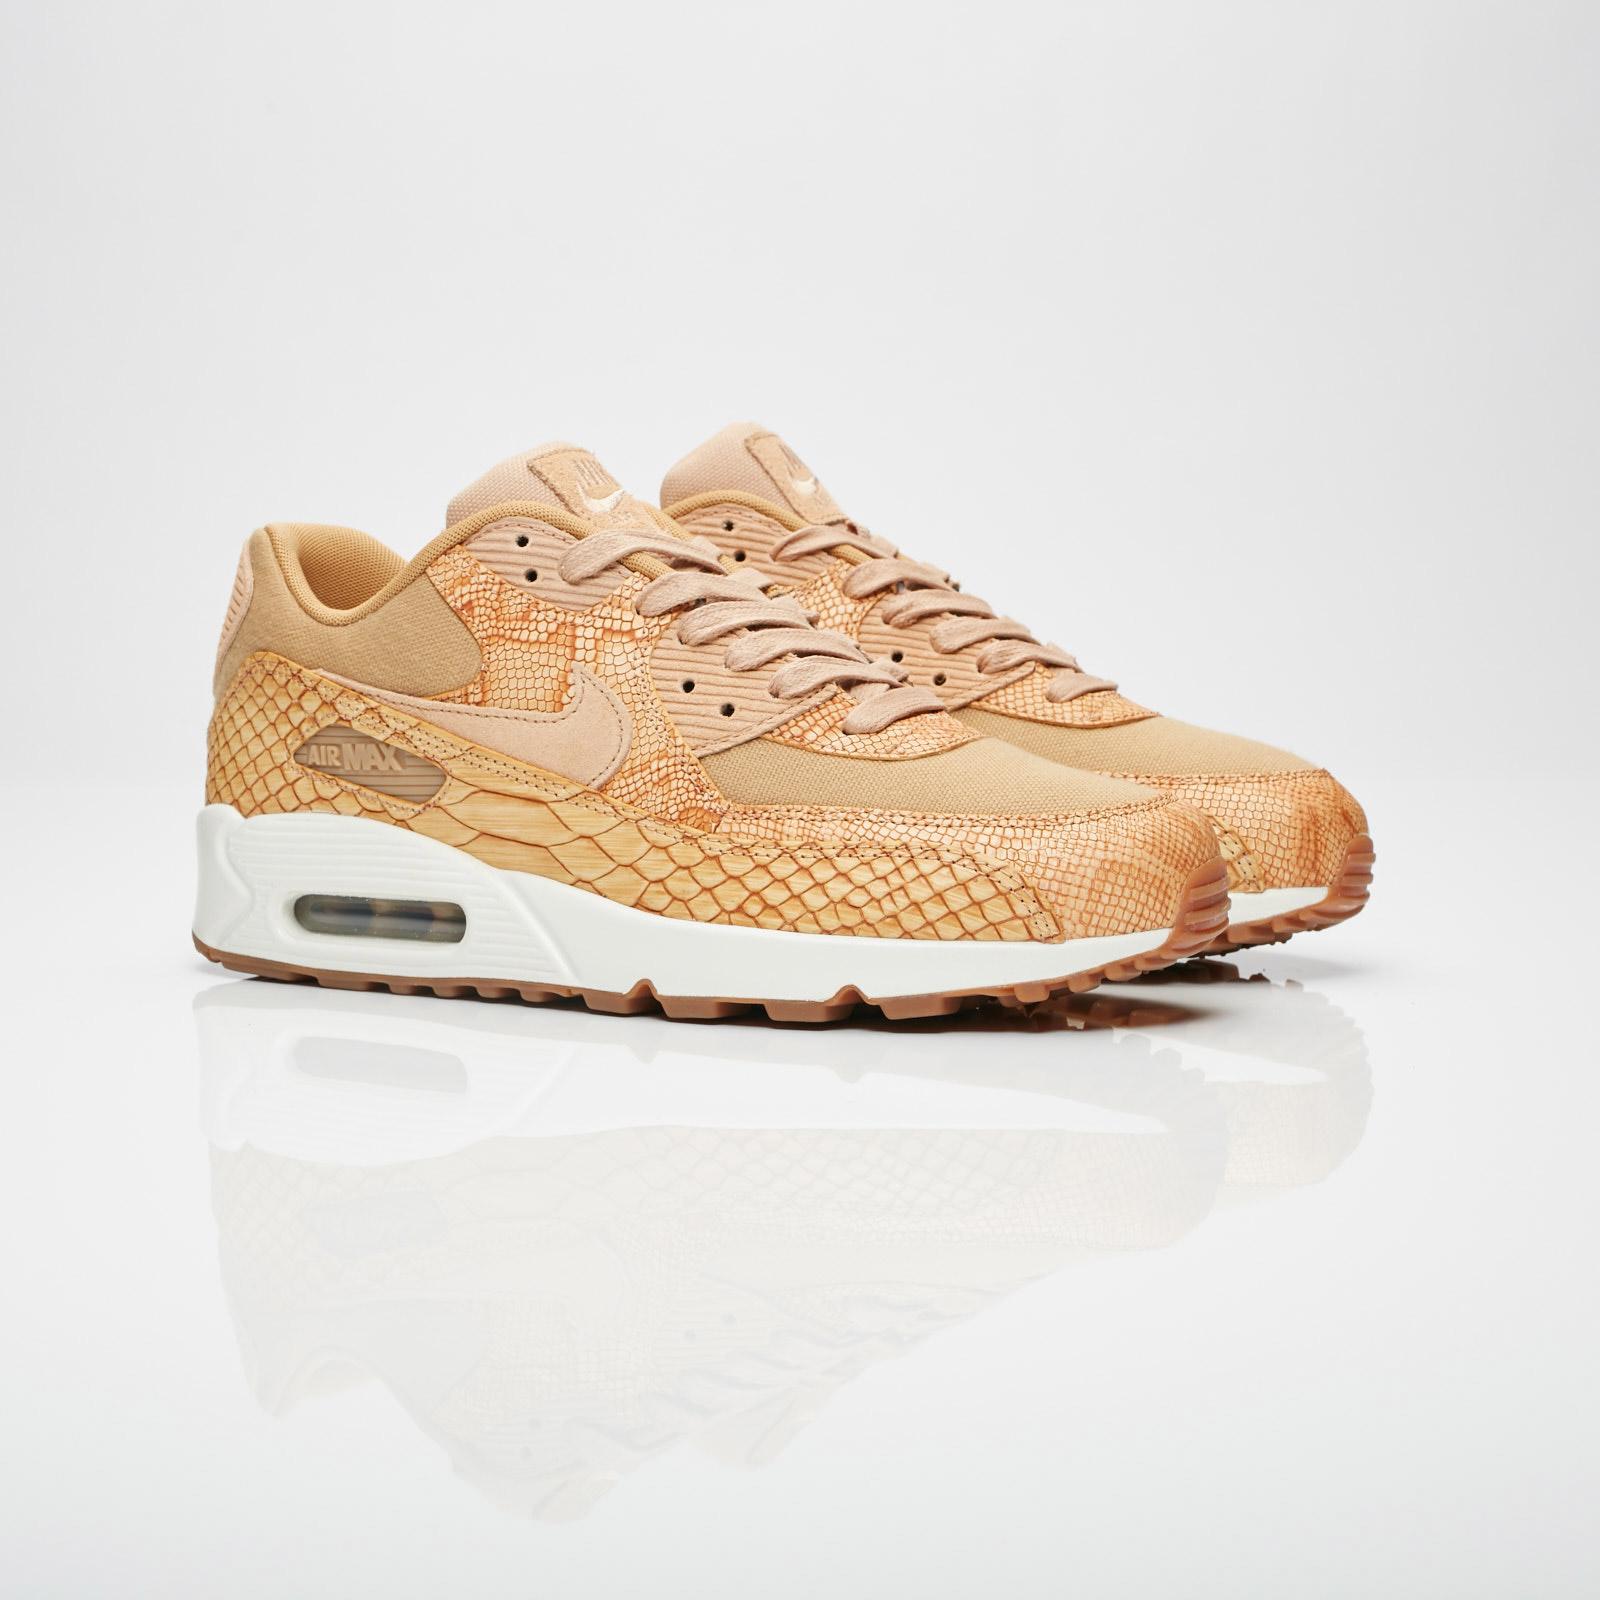 nike air max 90 premio ltr ah8046 200 sneakersnstuff scarpe